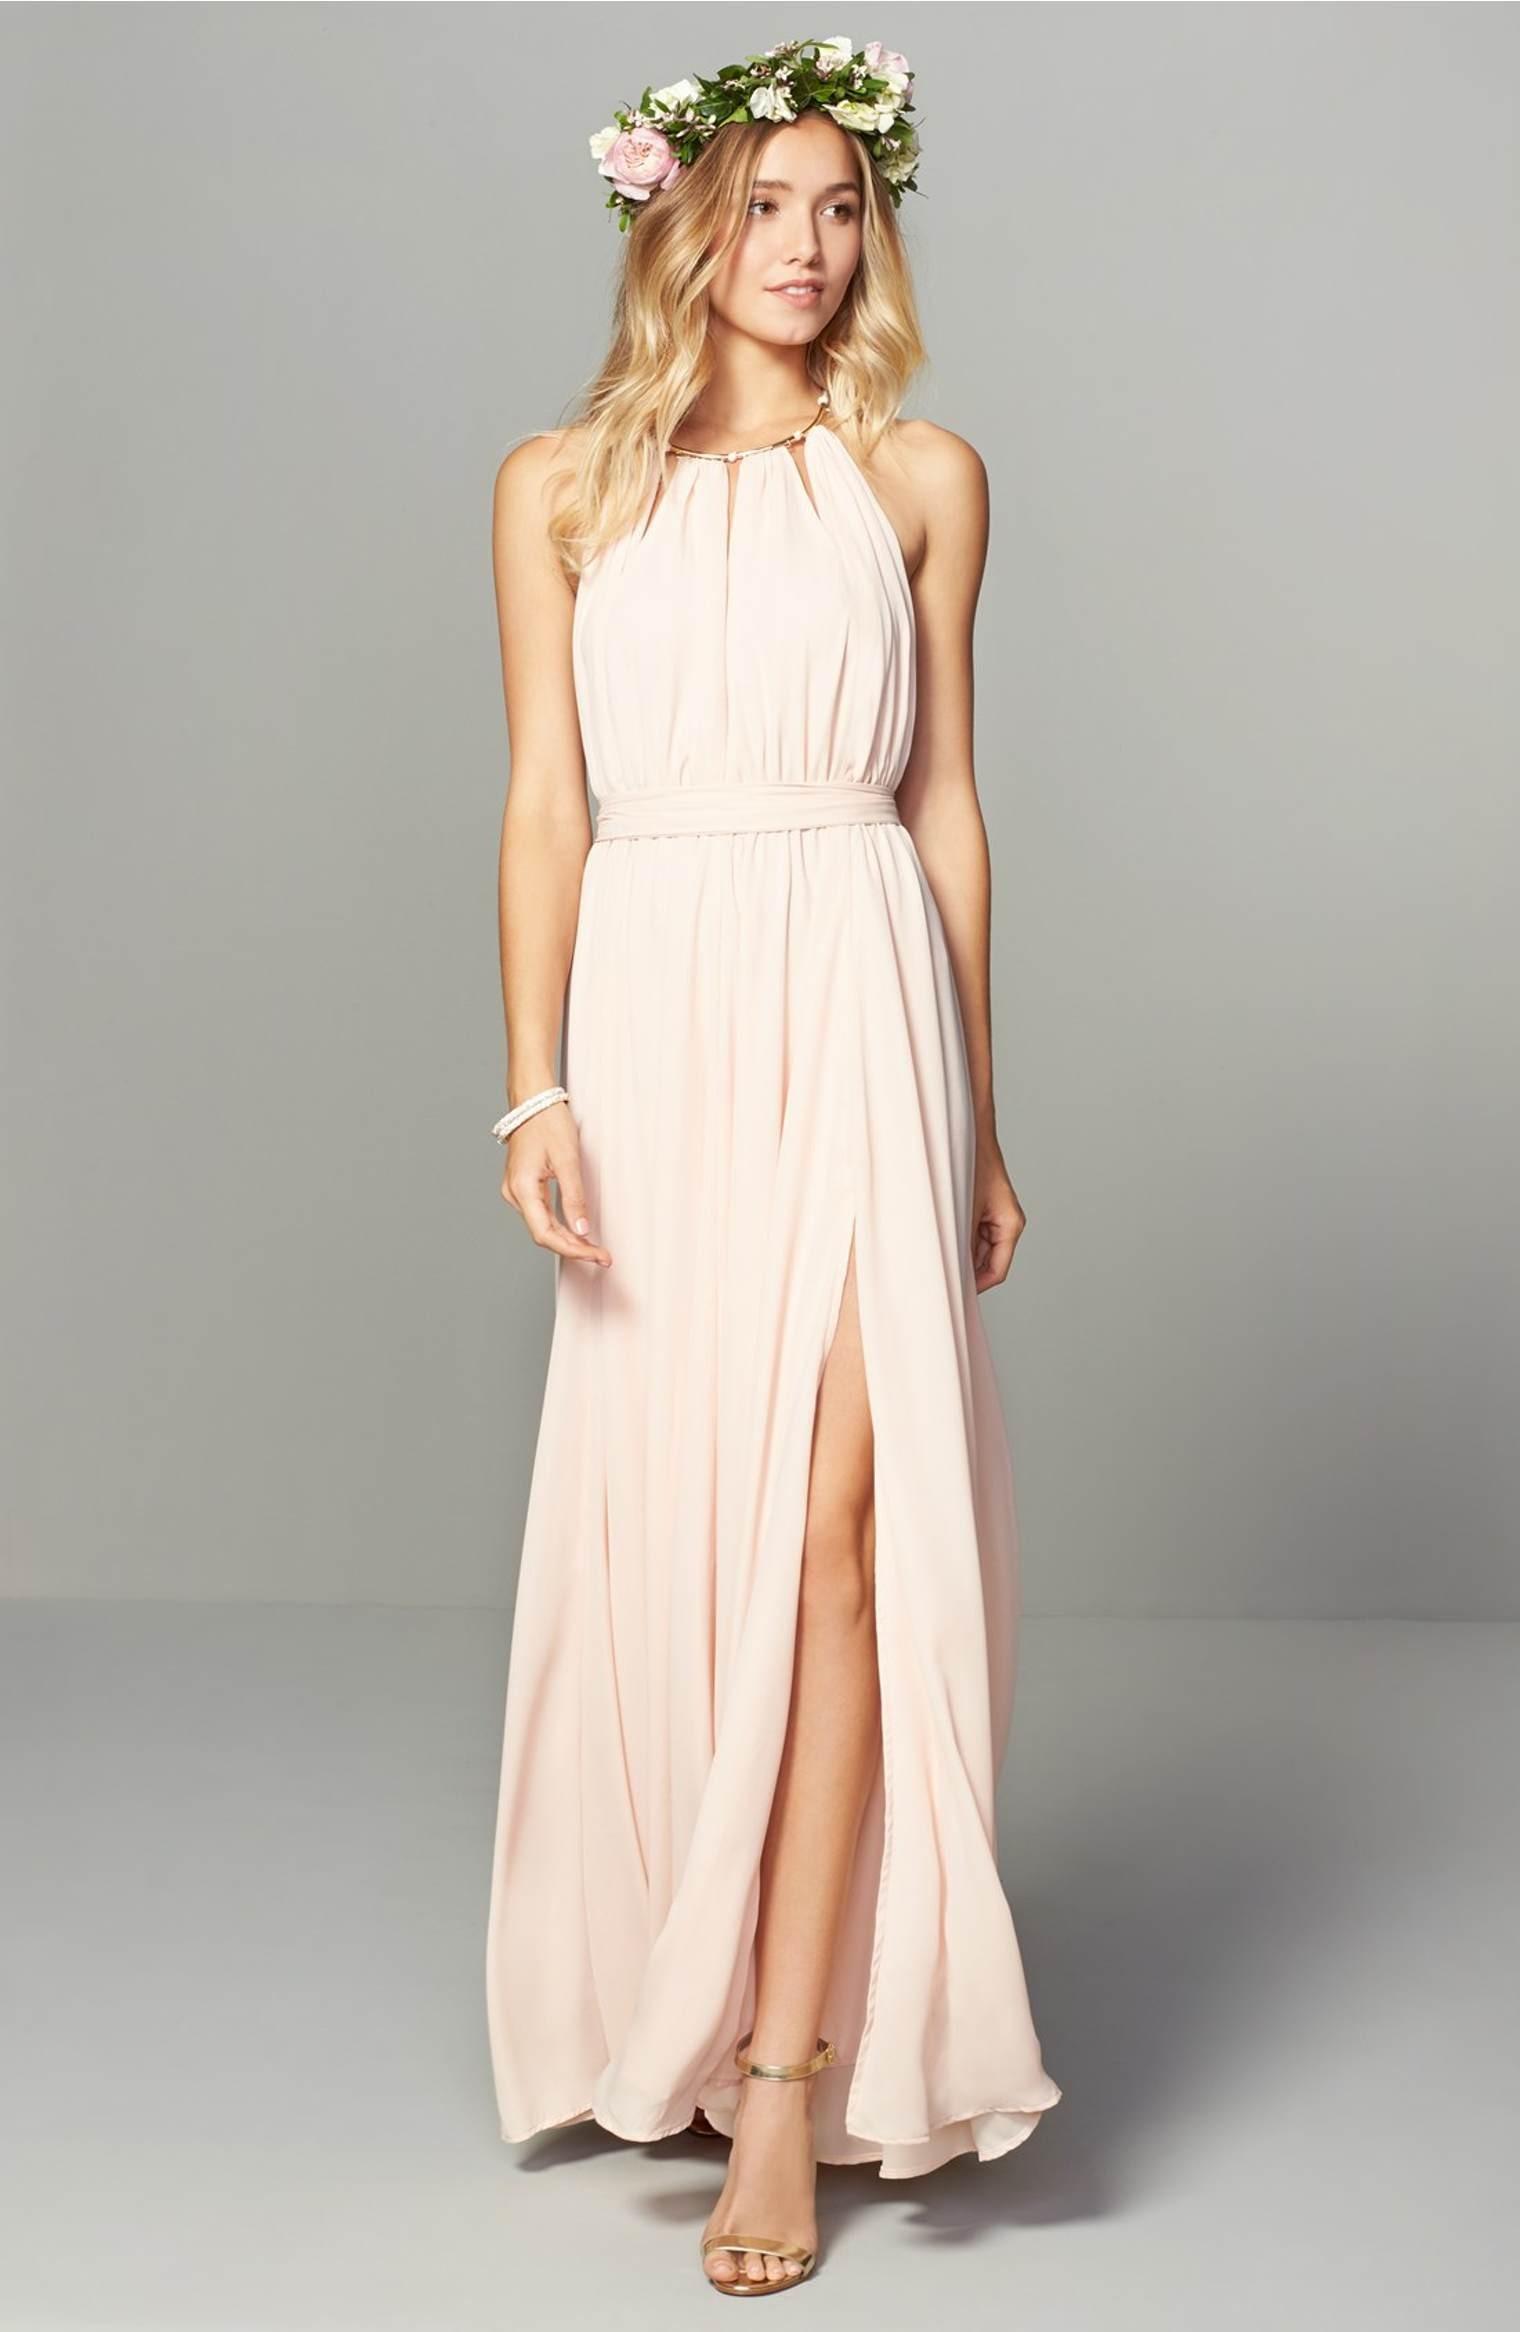 Cute Blush Pink Chiffon Long Bridesmaid Dresses,Halter Sleeveless ...